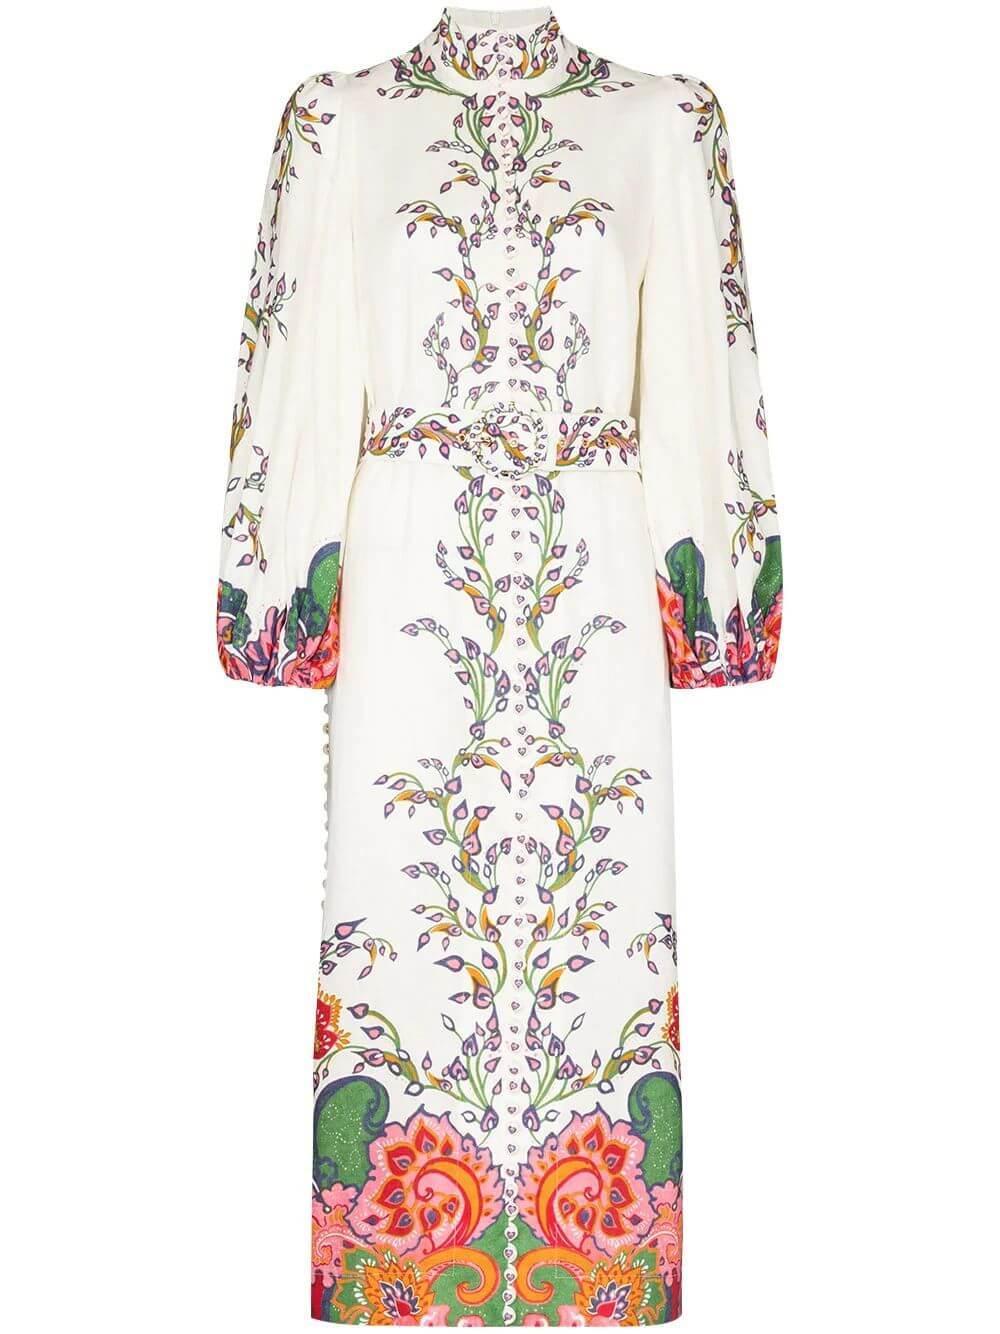 The Lovestruck Midi Dress Item # 9719DAND